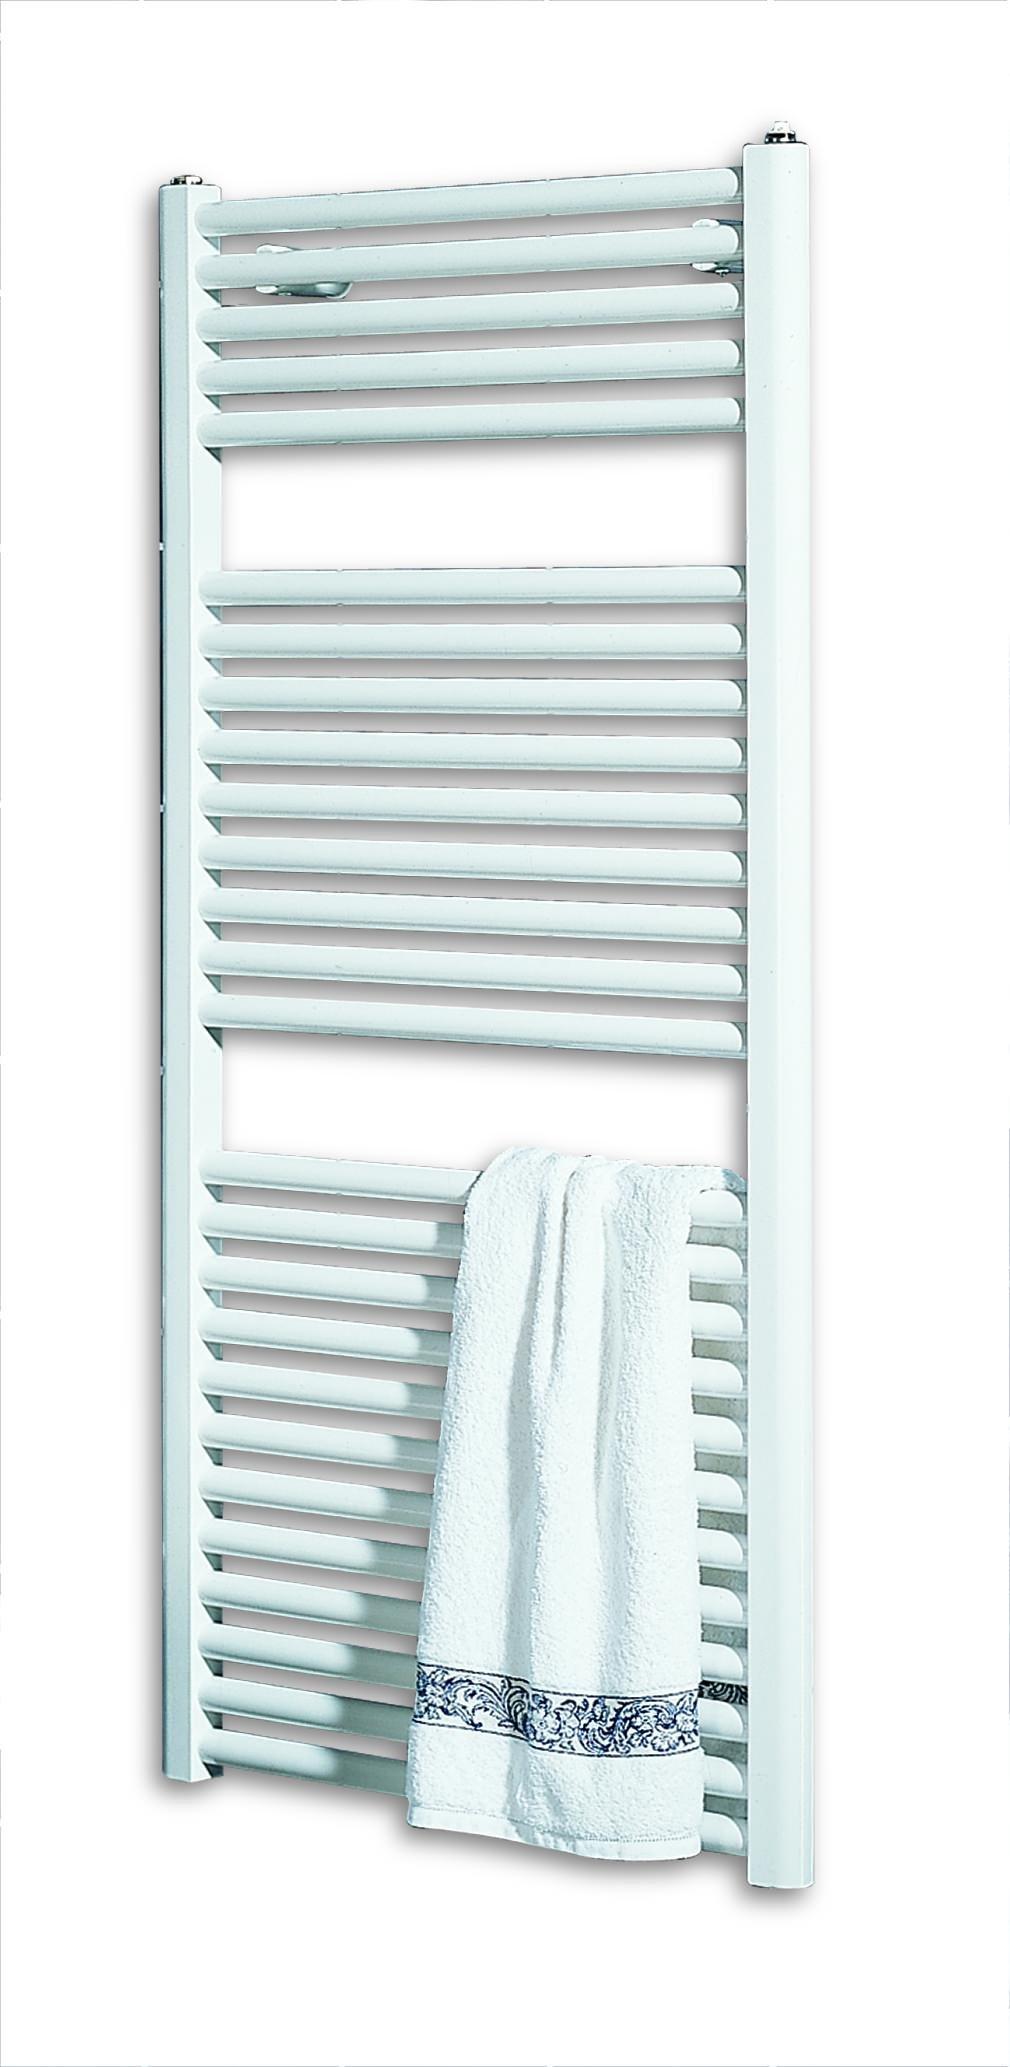 Schulte Monaco radiatore bagno 775mm x 400mm Bianco alpino 361Watt en442H0764004